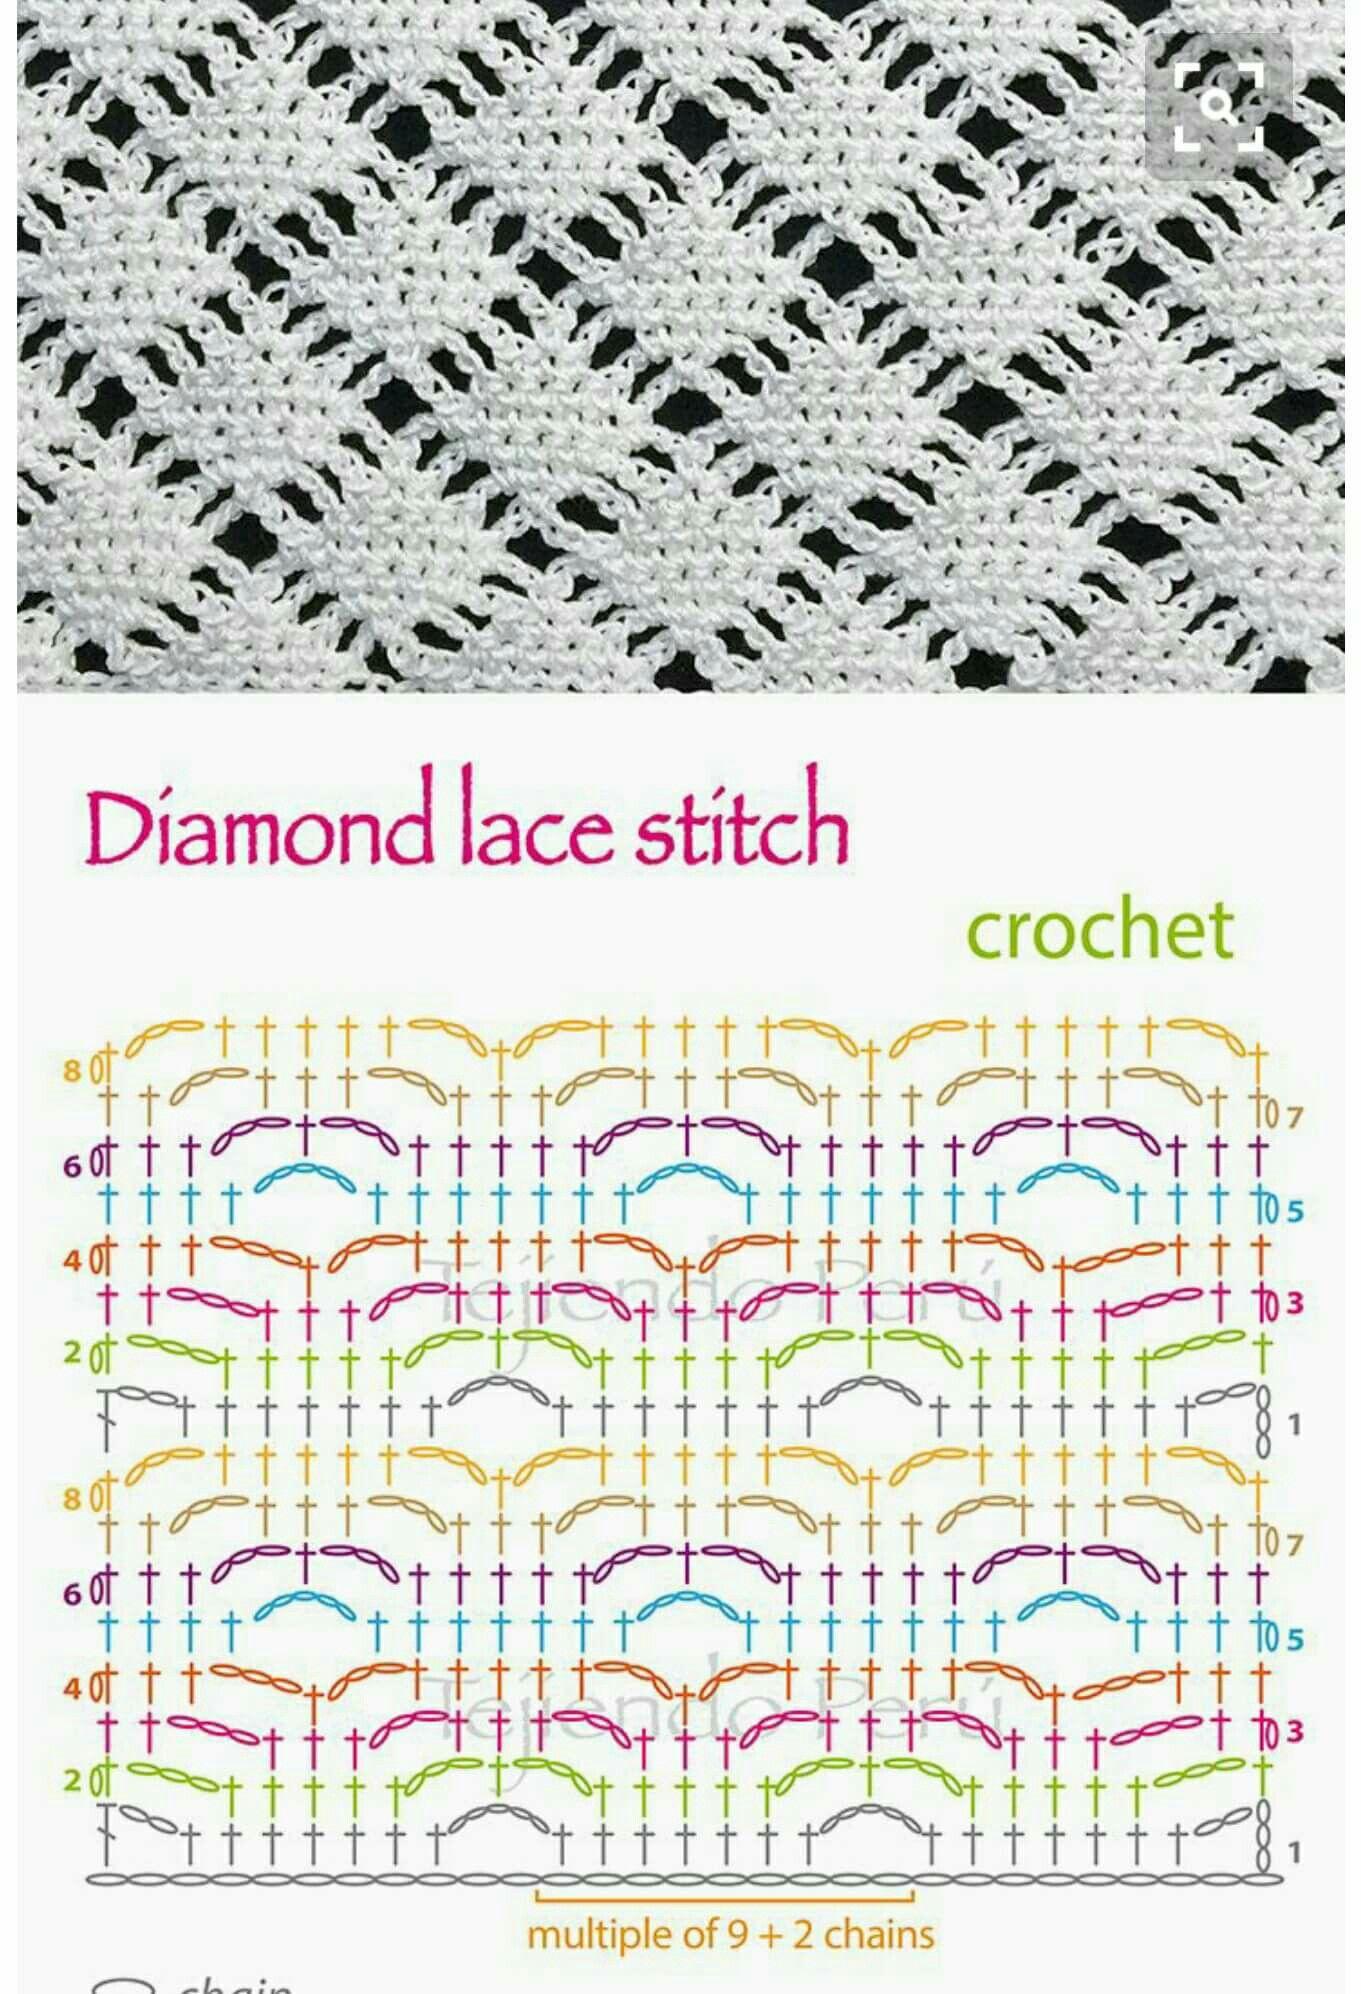 Pin by Margarita Corchado on Crochet pattern Charts | Pinterest ...